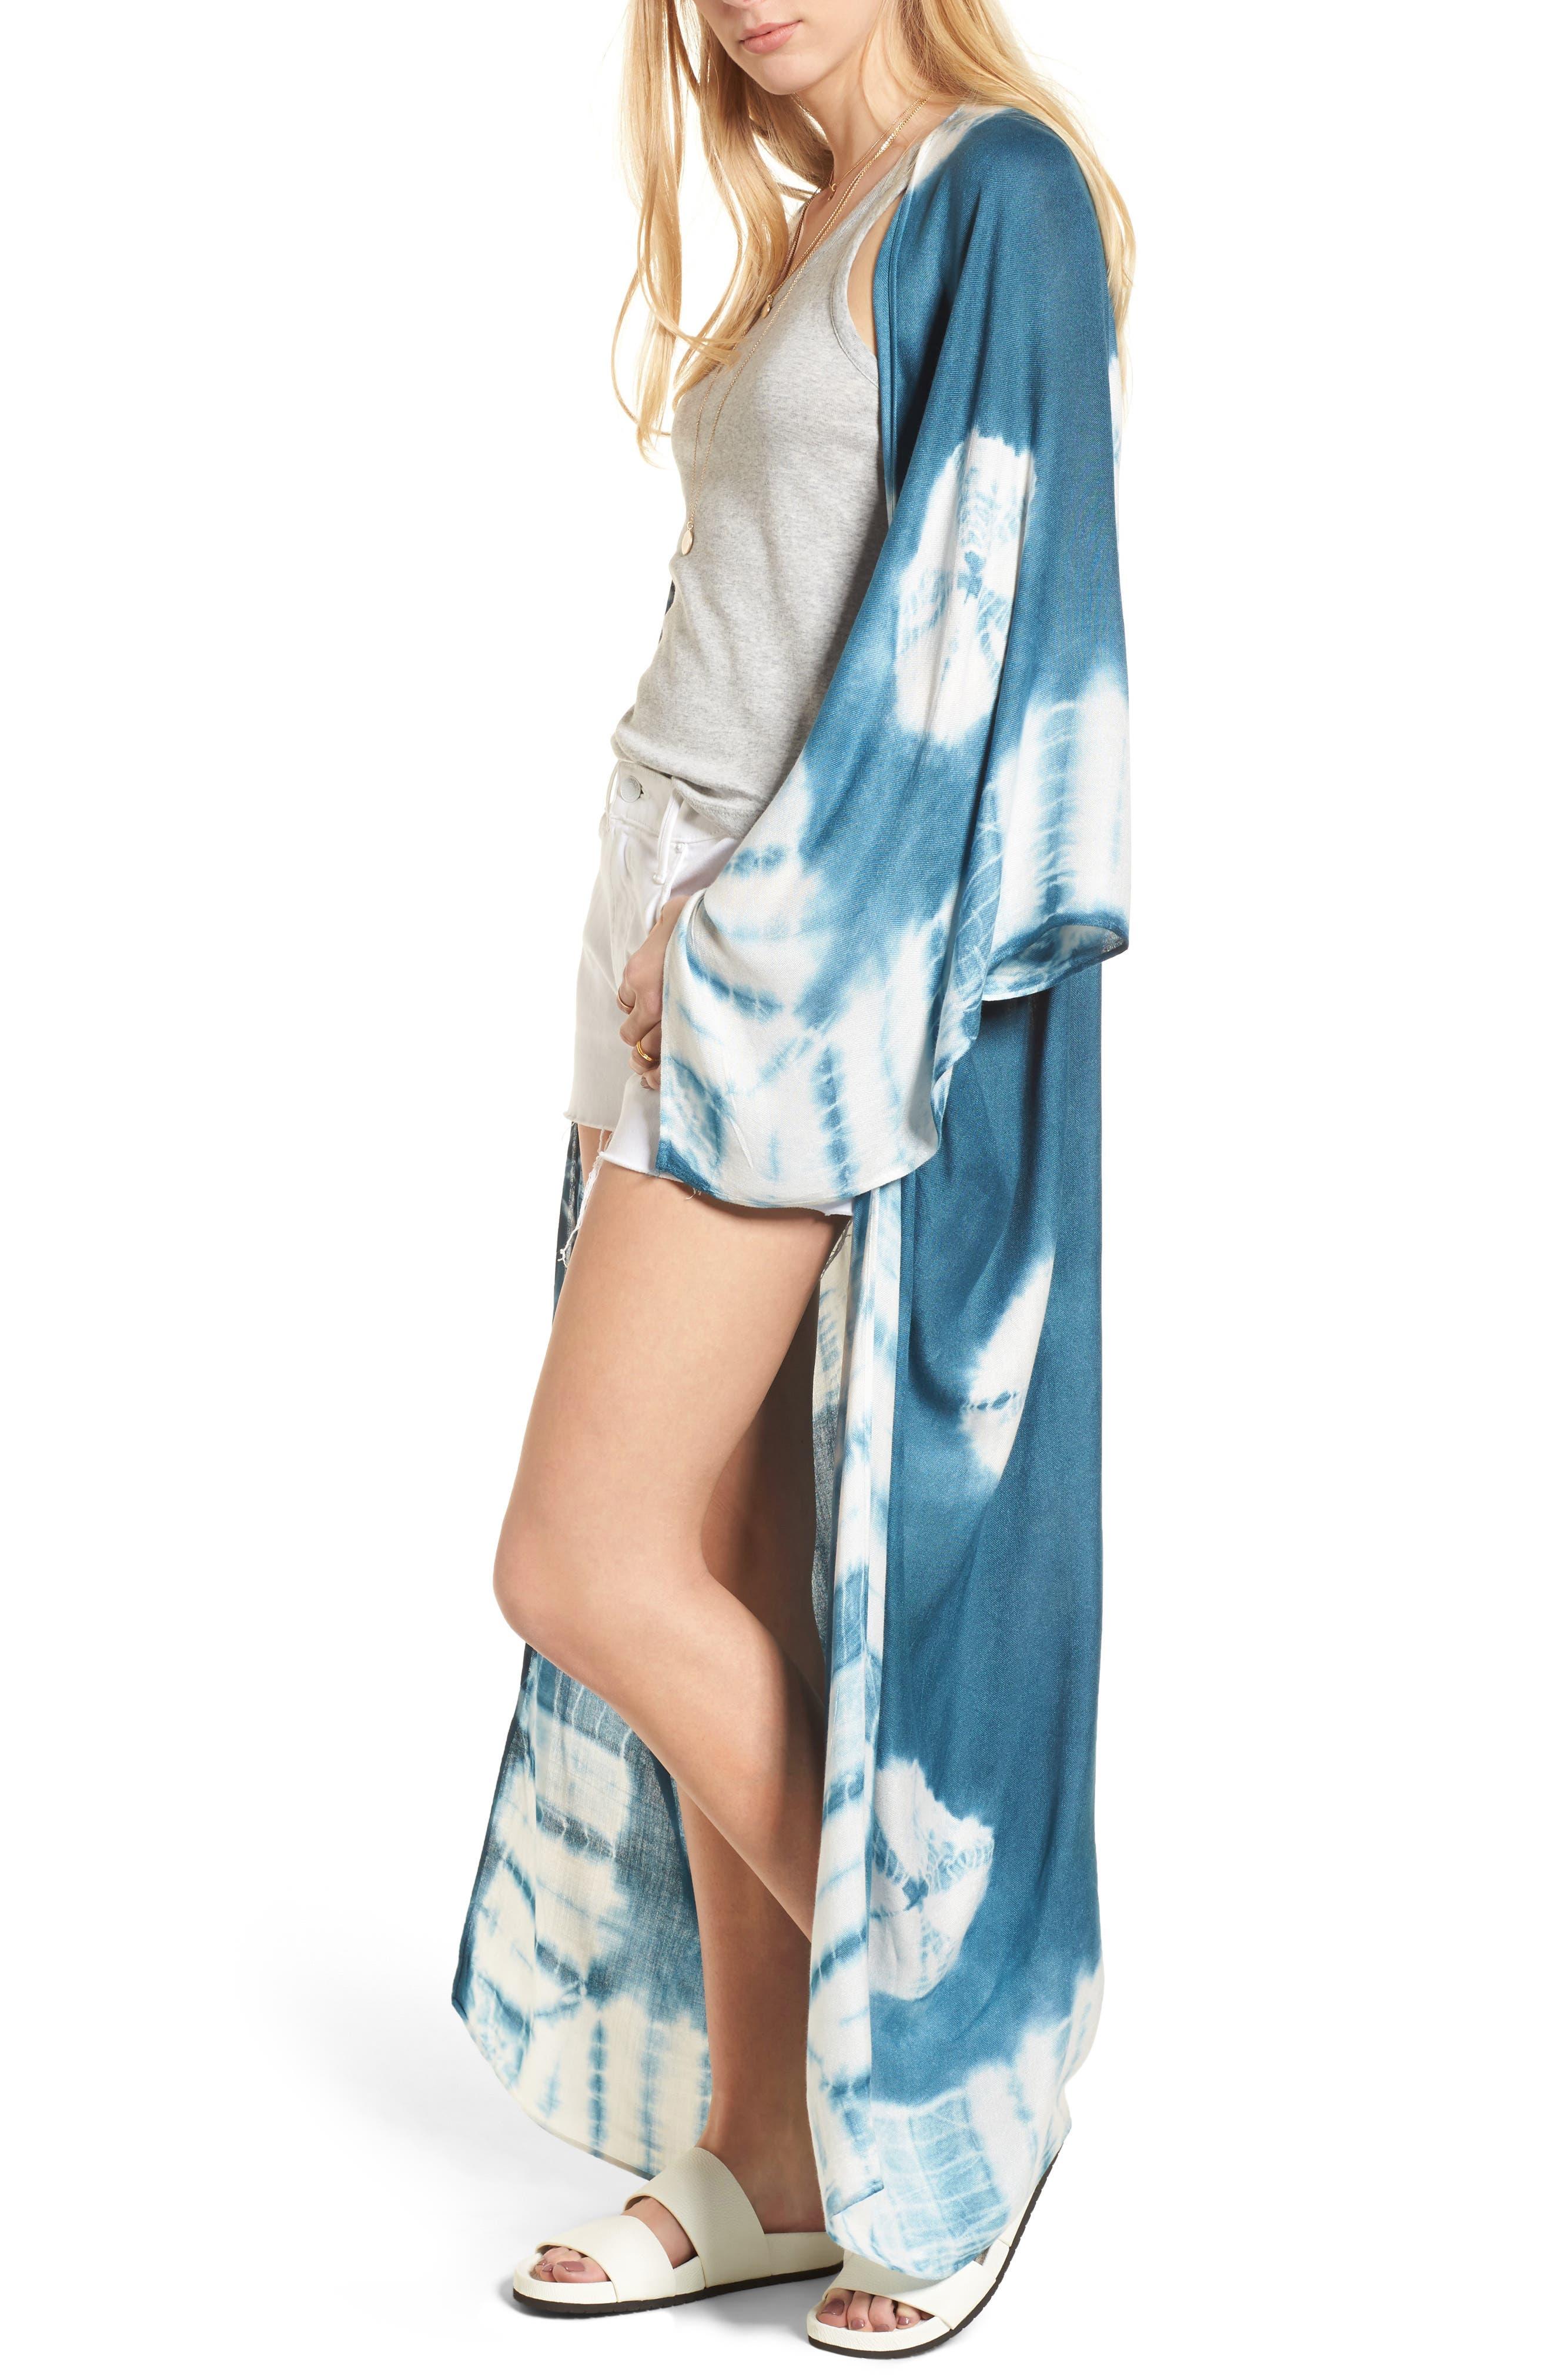 Free People Spellbound Tie Dye Kimono Duster